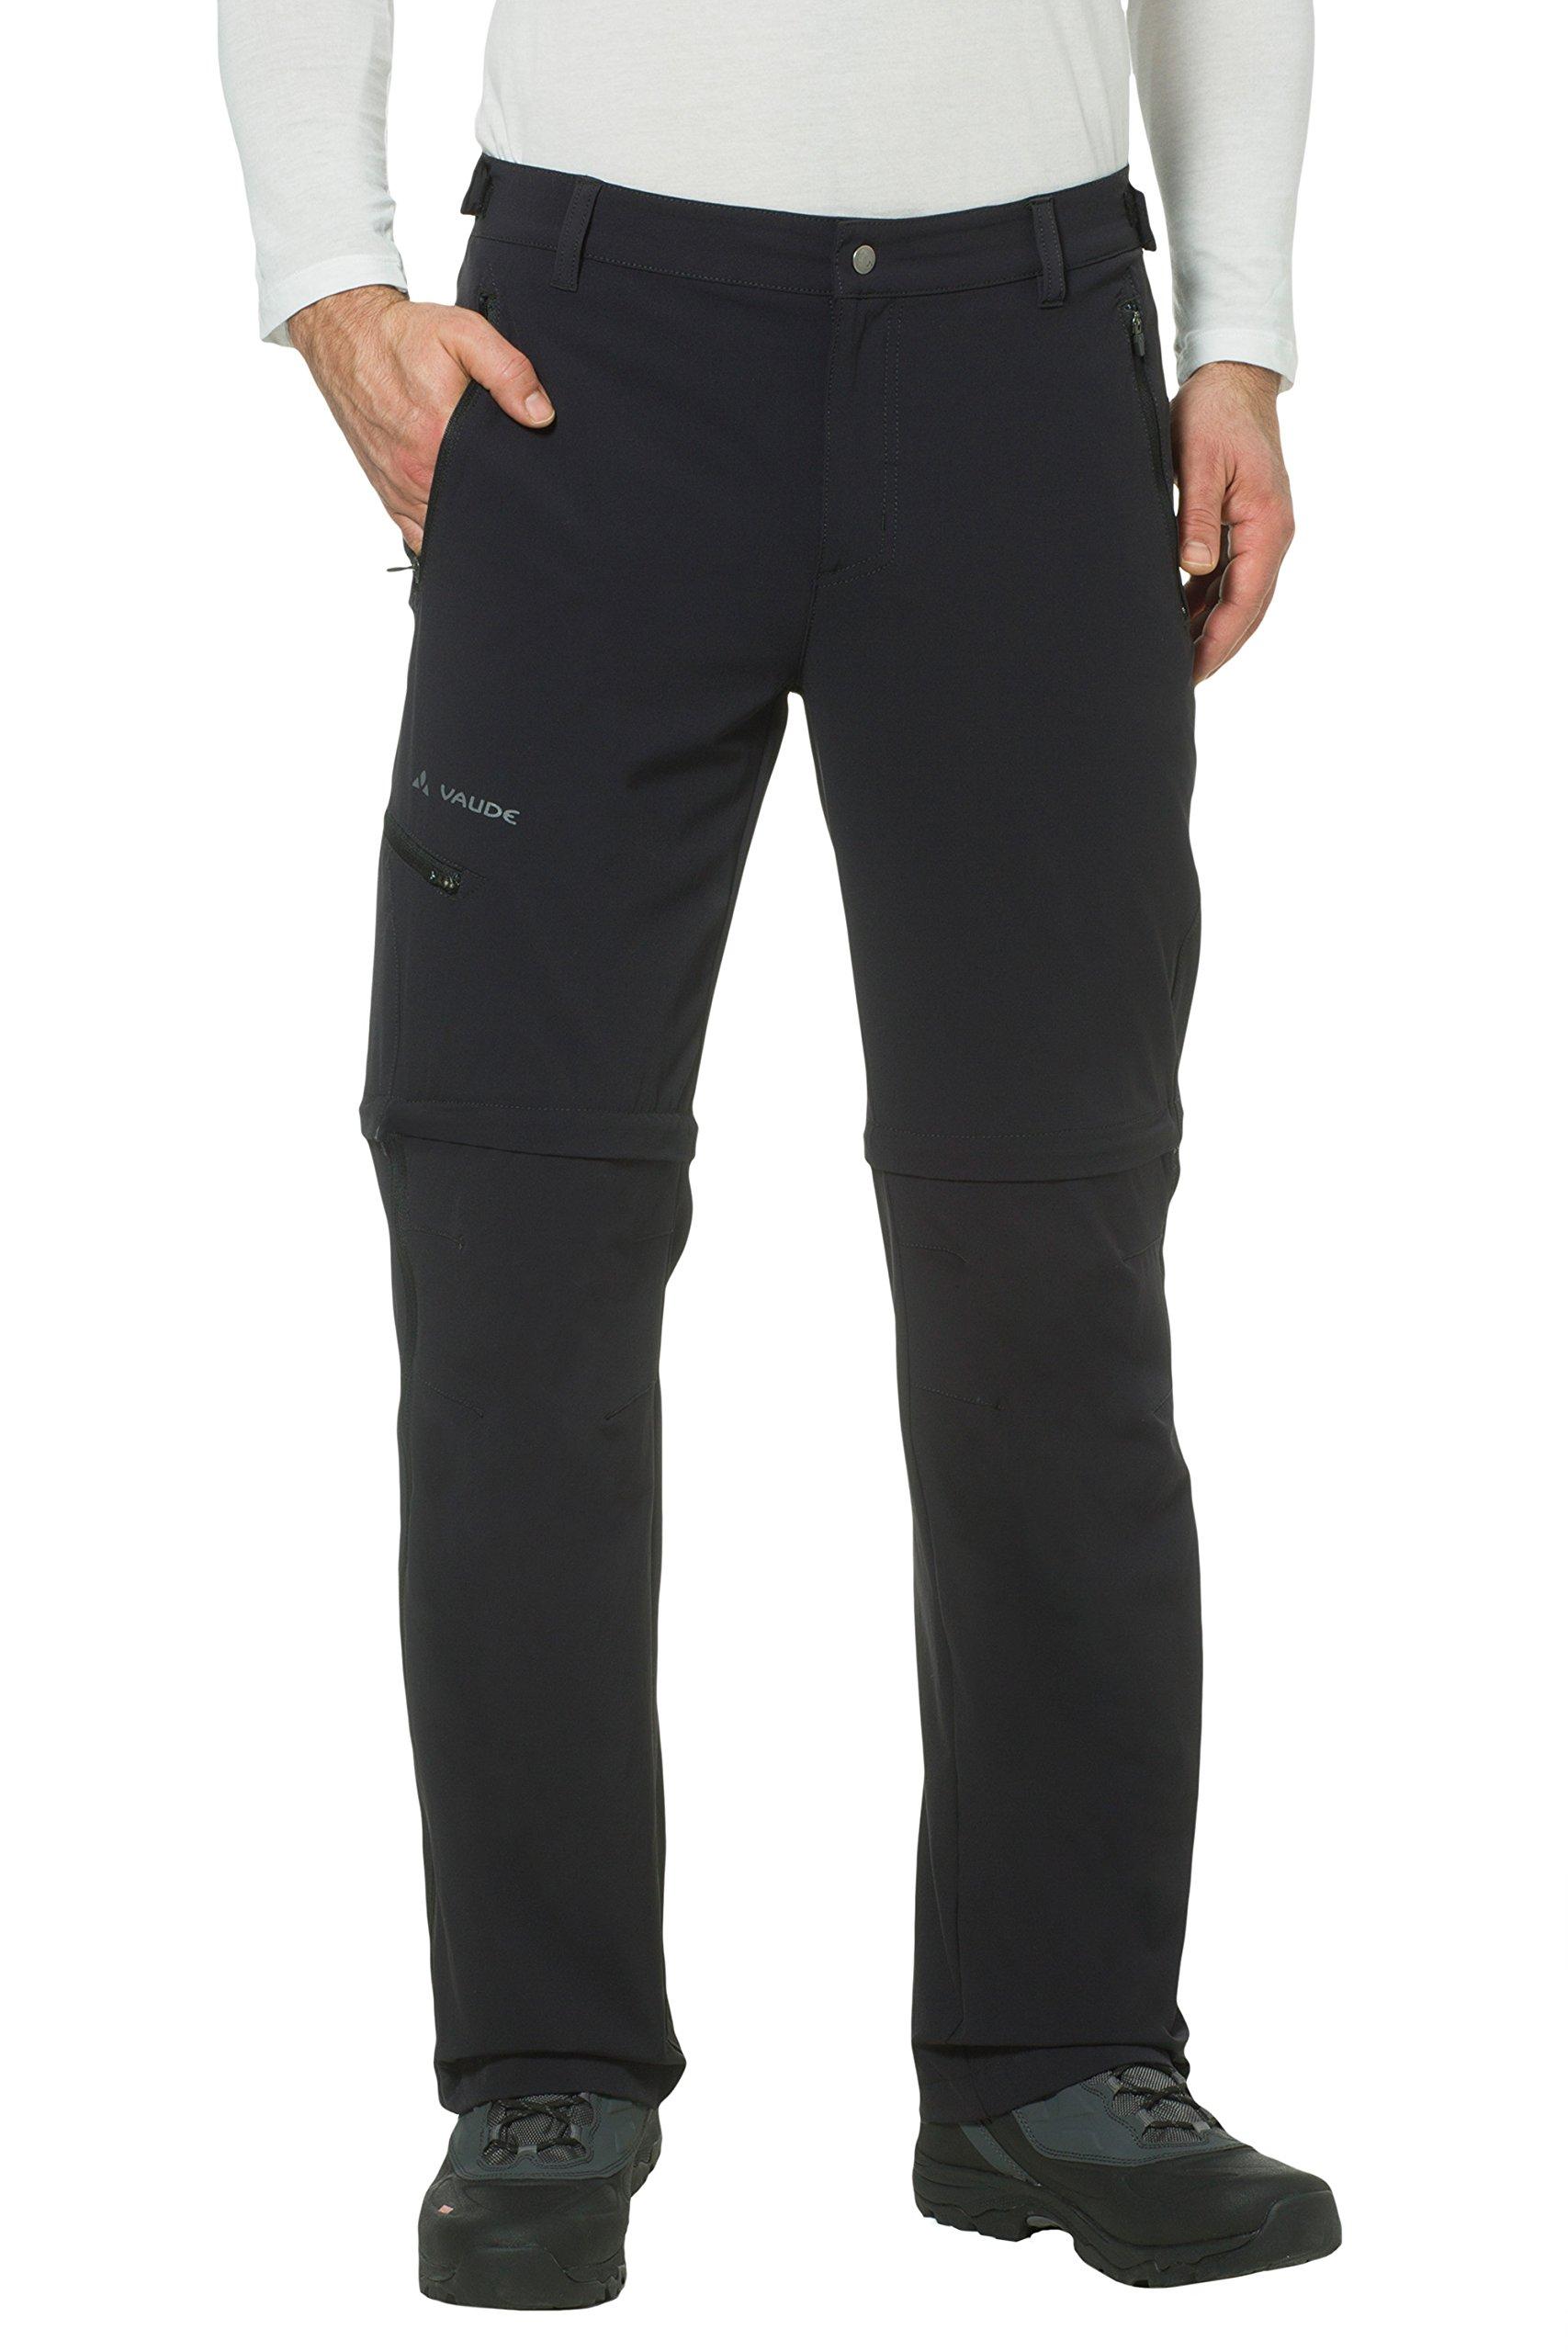 b9e8f763 Amazon.com: VAUDE : Men's Pants